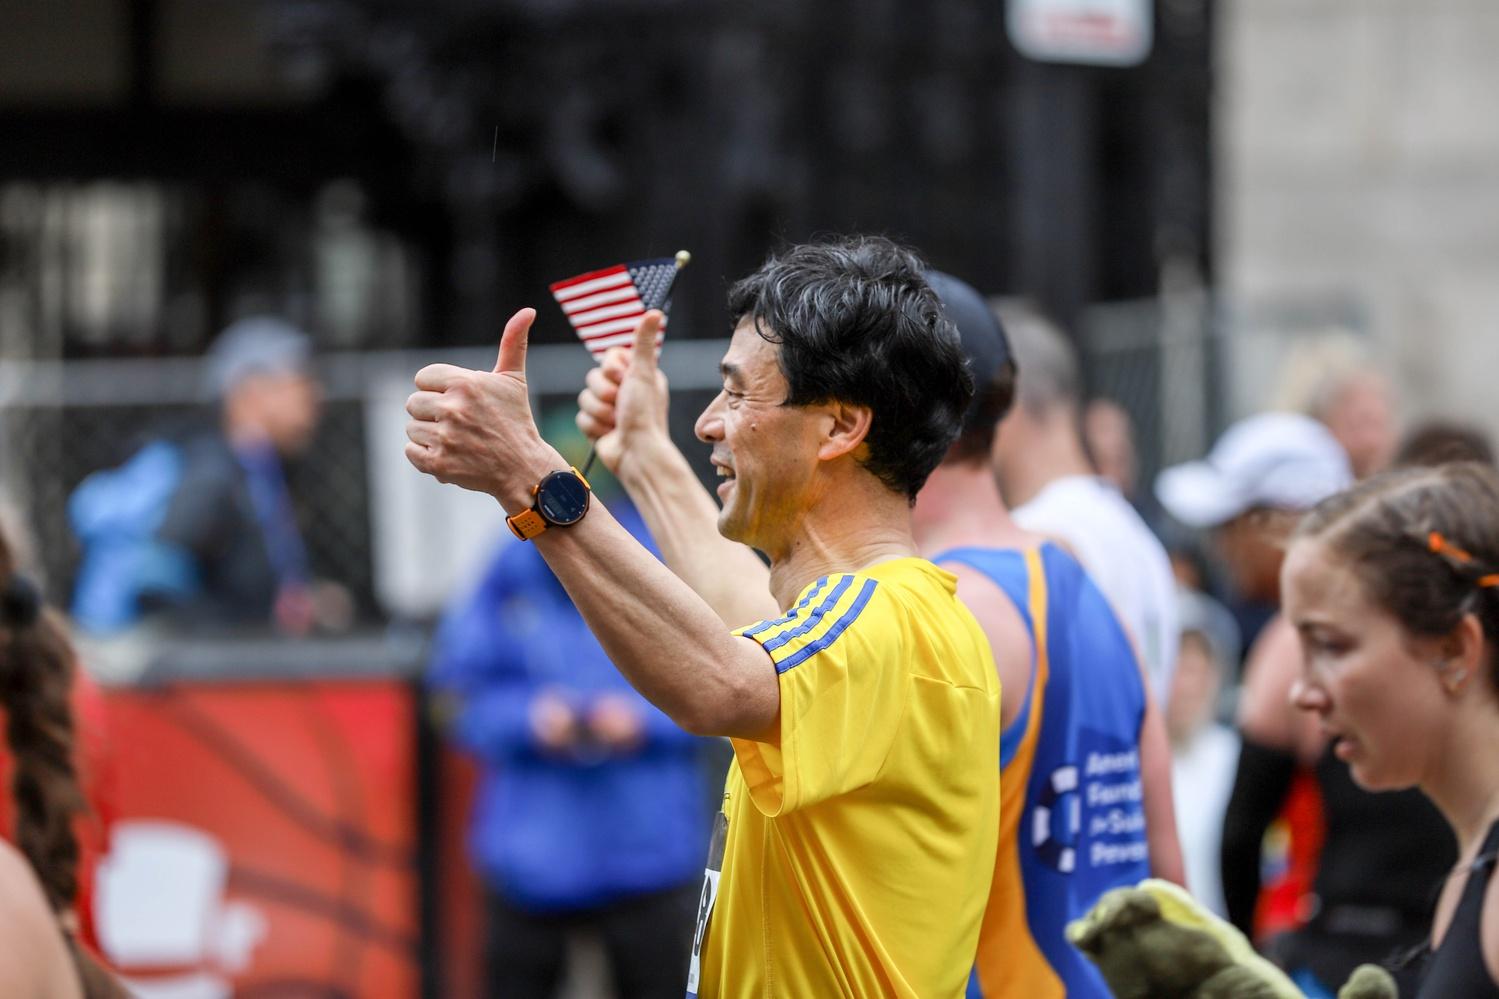 Boston Marathon 2019 10